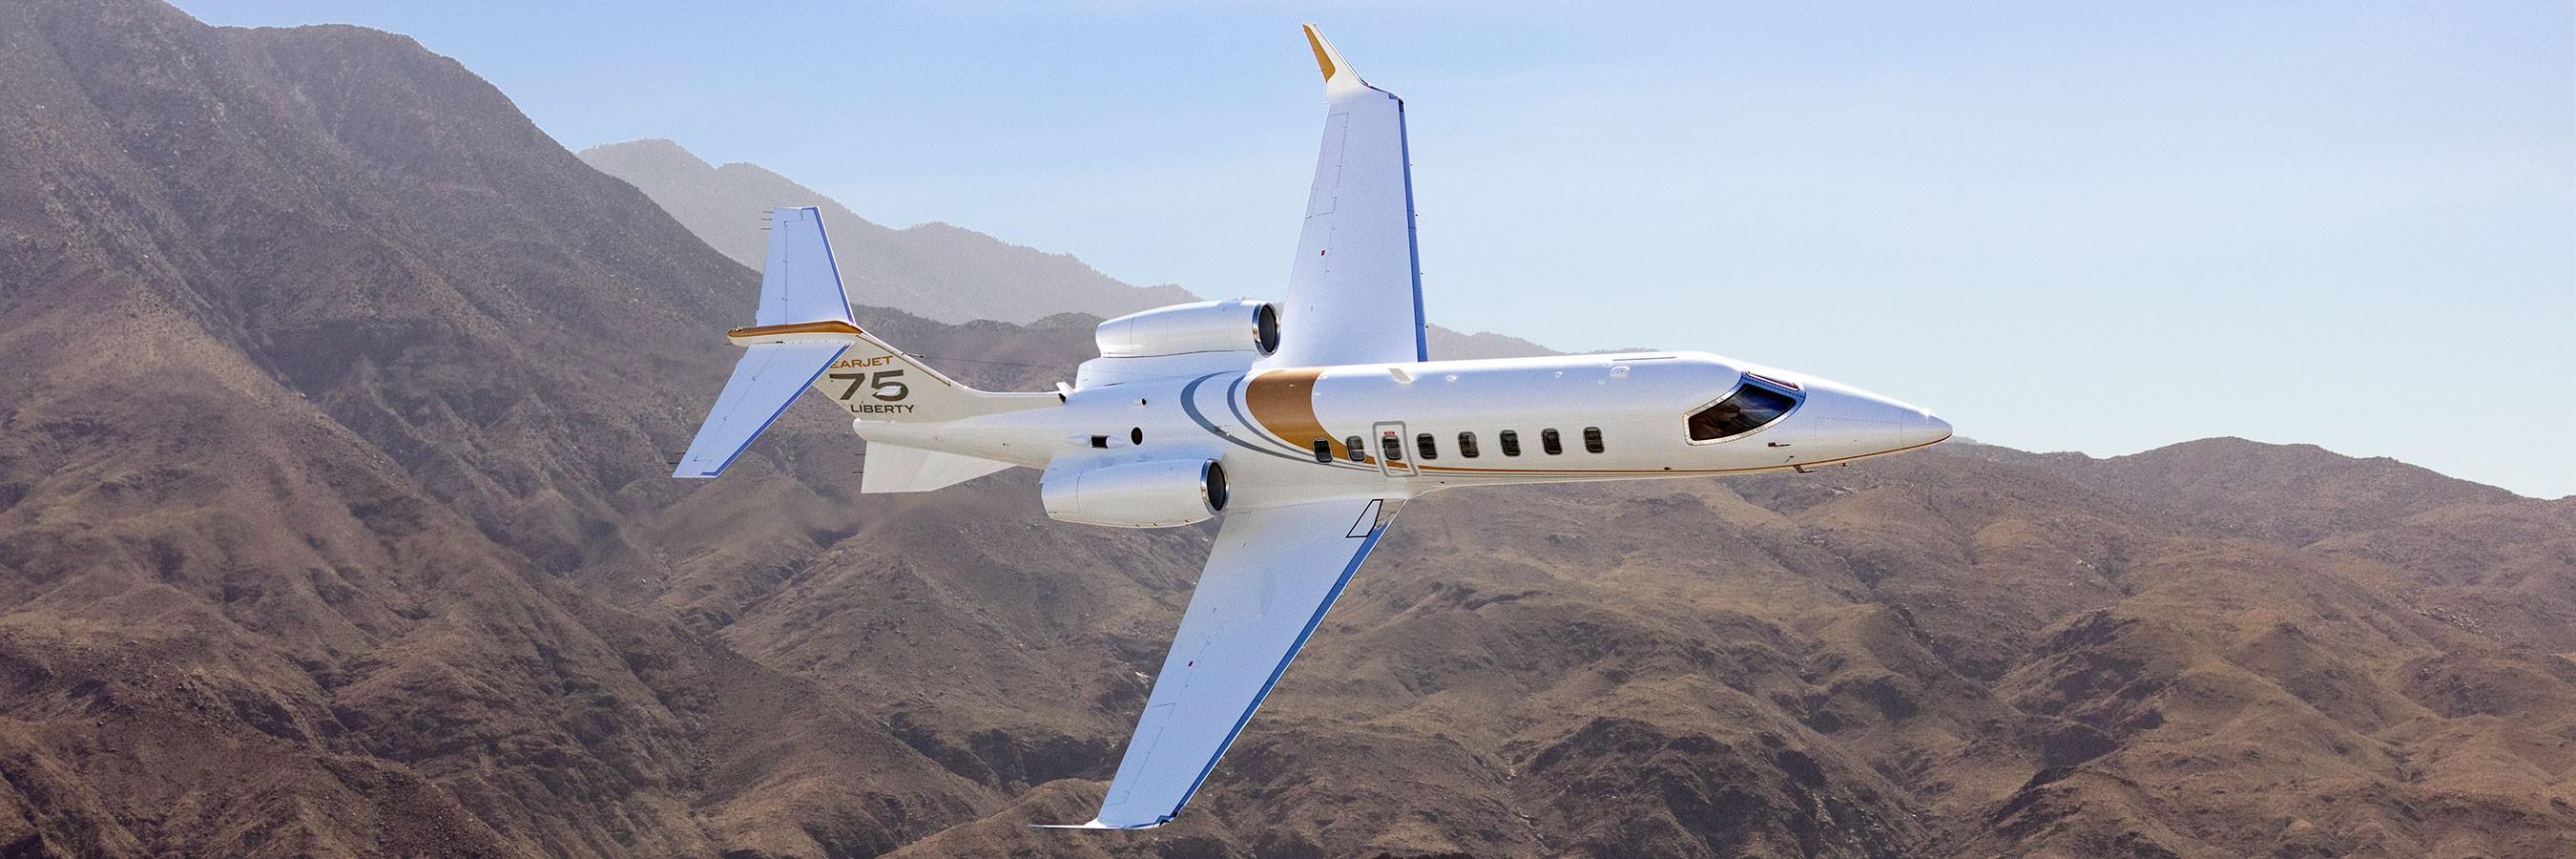 Learjet 75 Liberty - Leading operating costs, Learjet performance